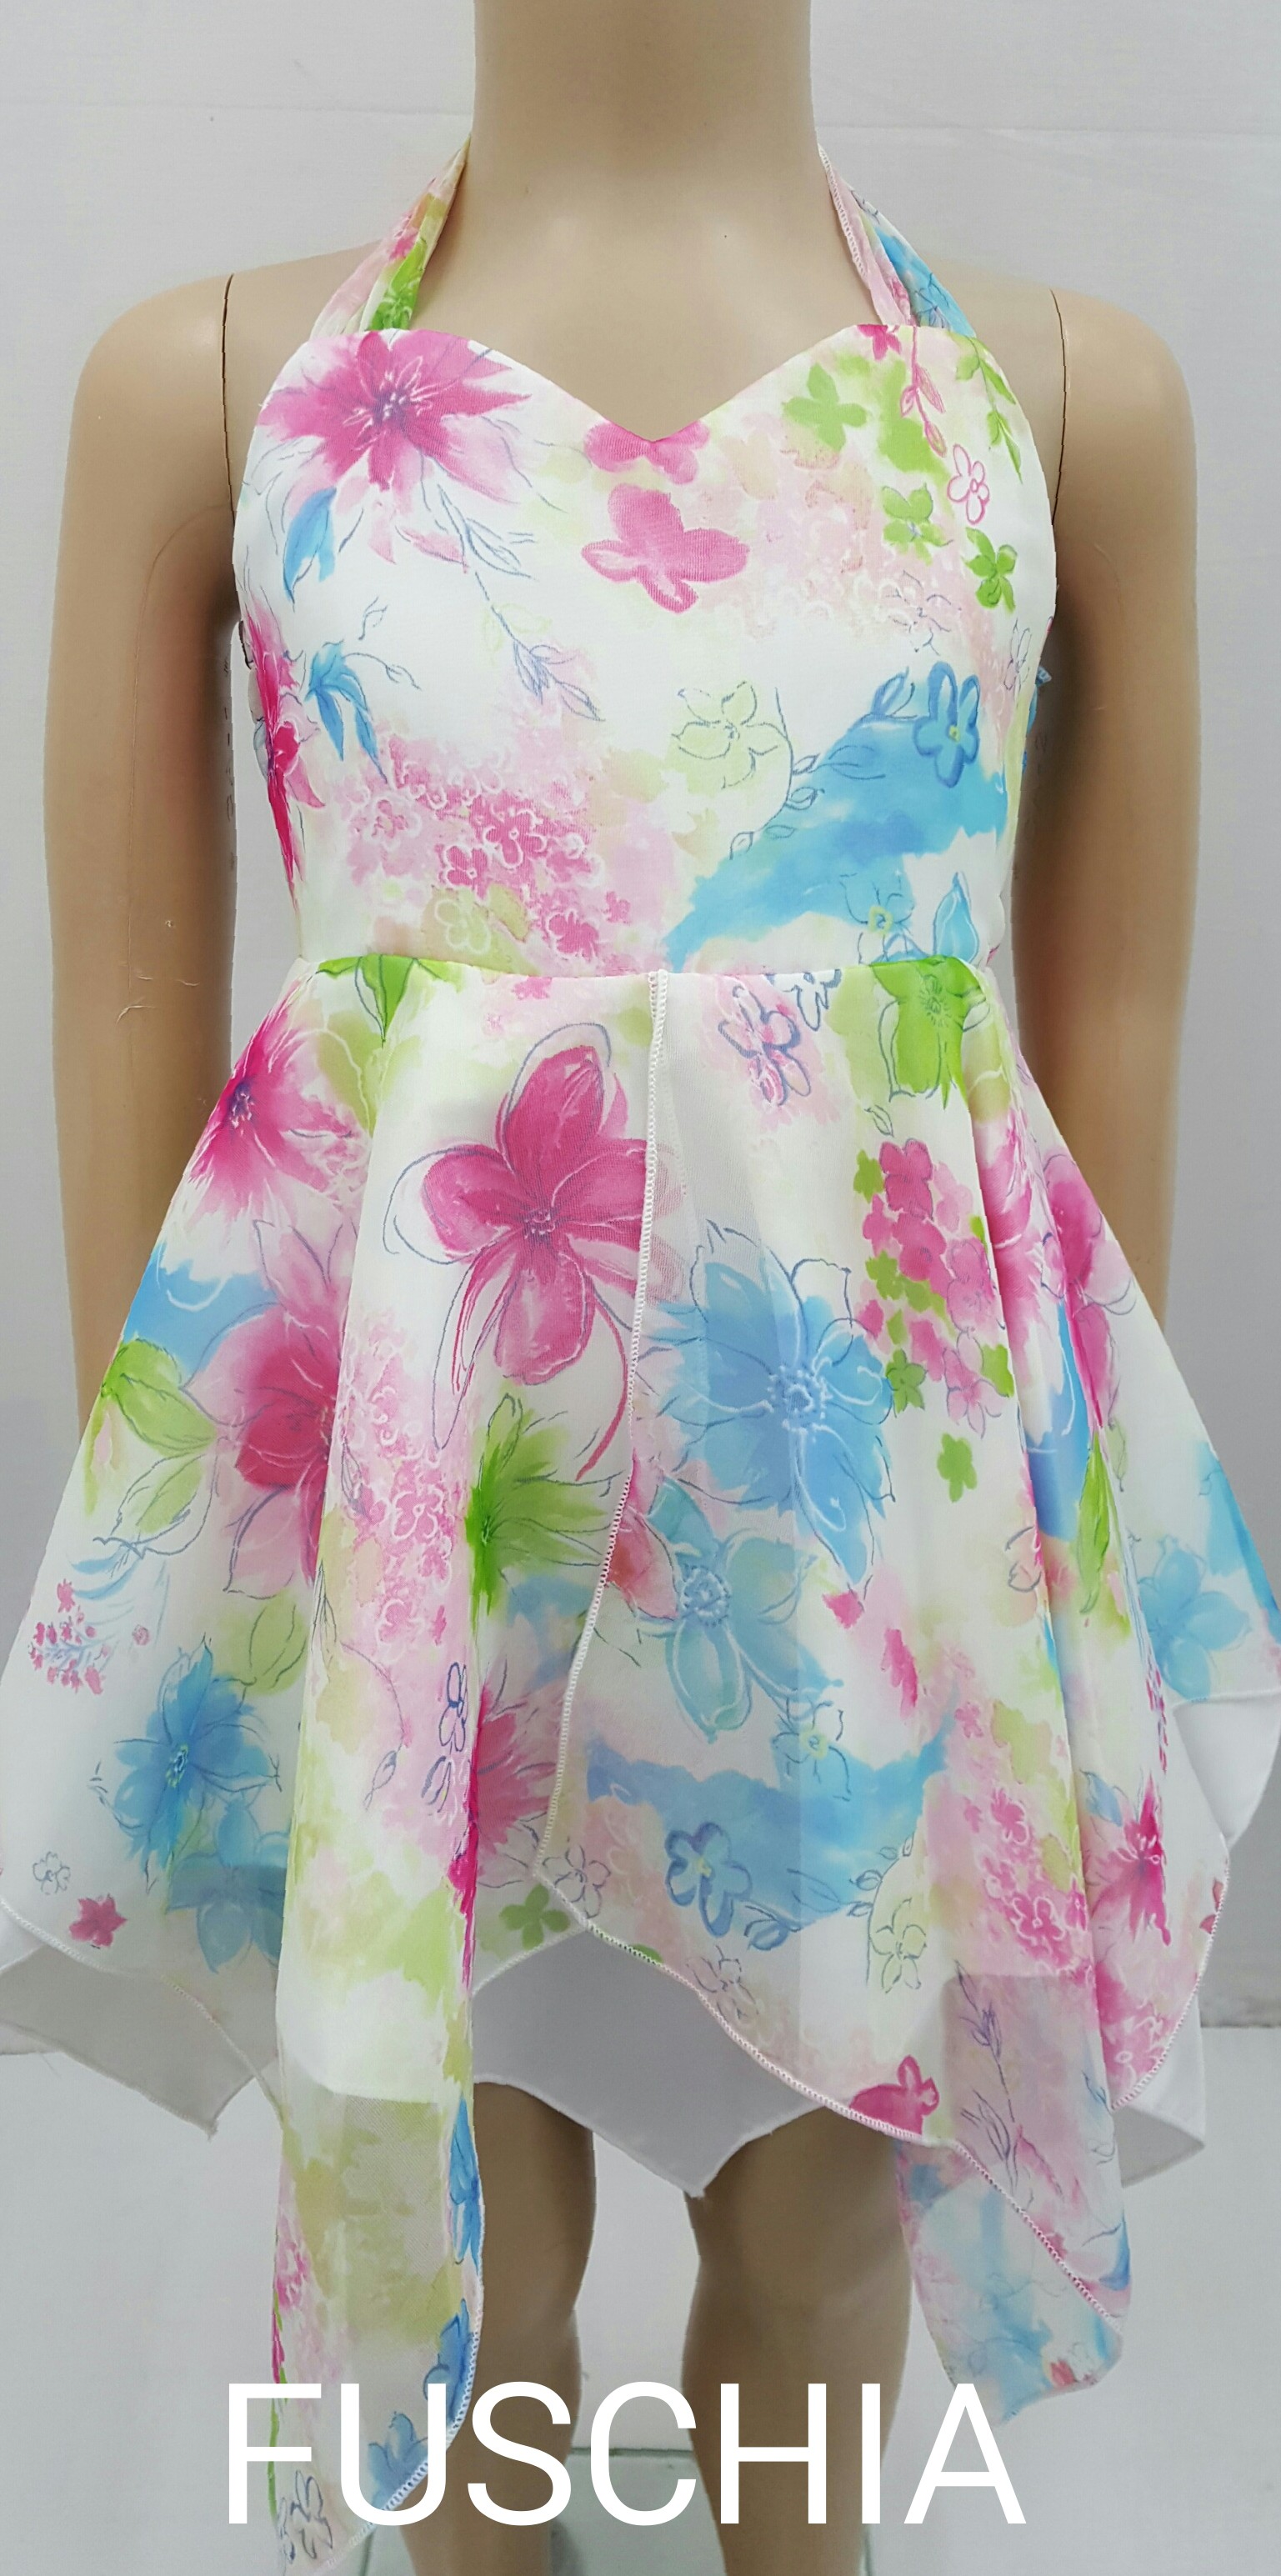 Halter Neck Dress Gd19 Gd19 12 00 Girls Dresses And